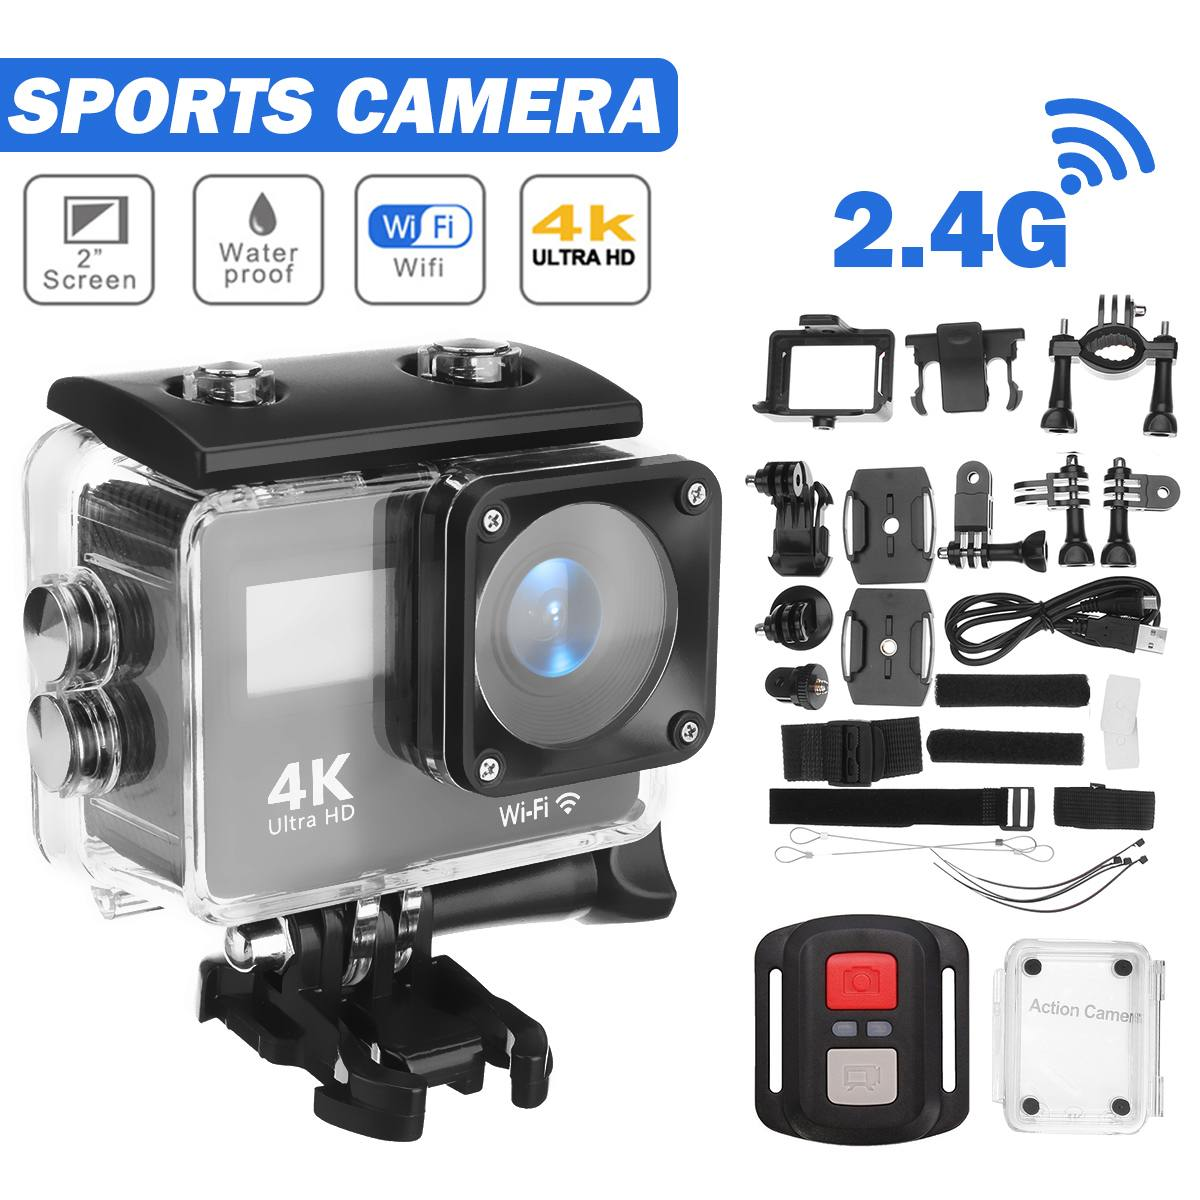 Action Camera 12MP Ultra HD 4K WiFi Remote Control Sports Video Recording Camcorder DVR DV go Waterproof pro Mini Helmet Camera